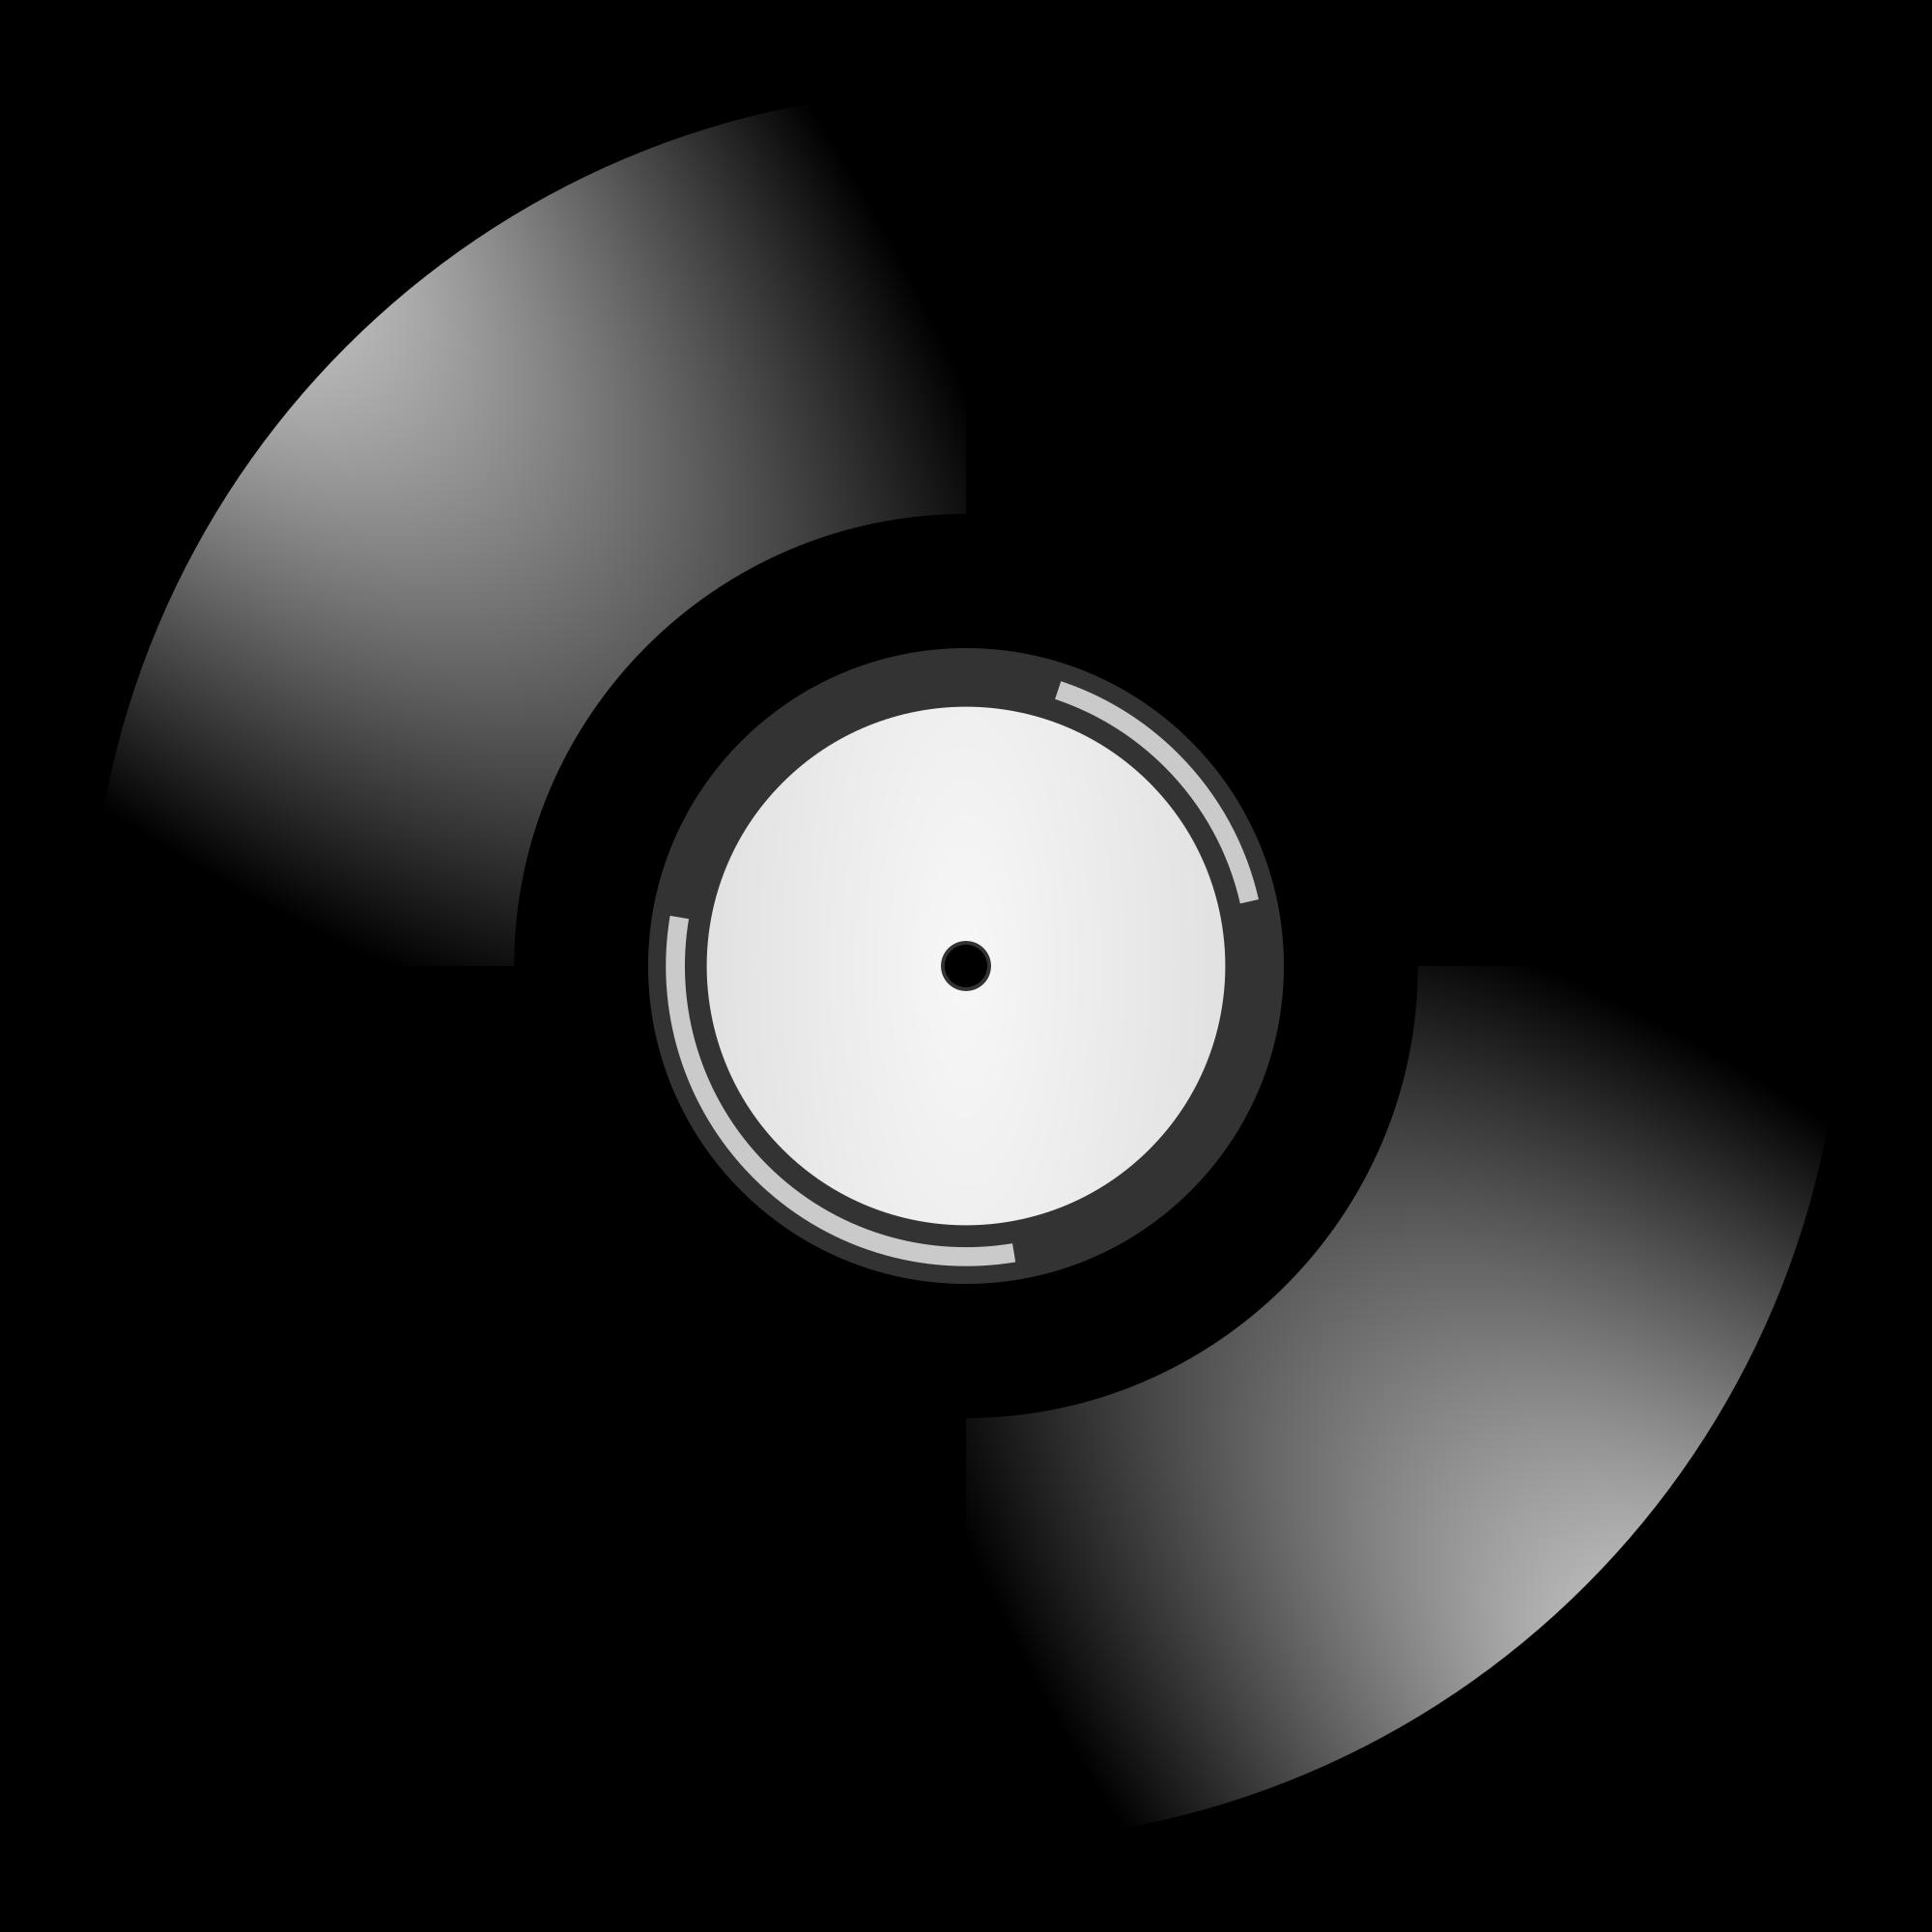 грампластинка PNG, пластинка